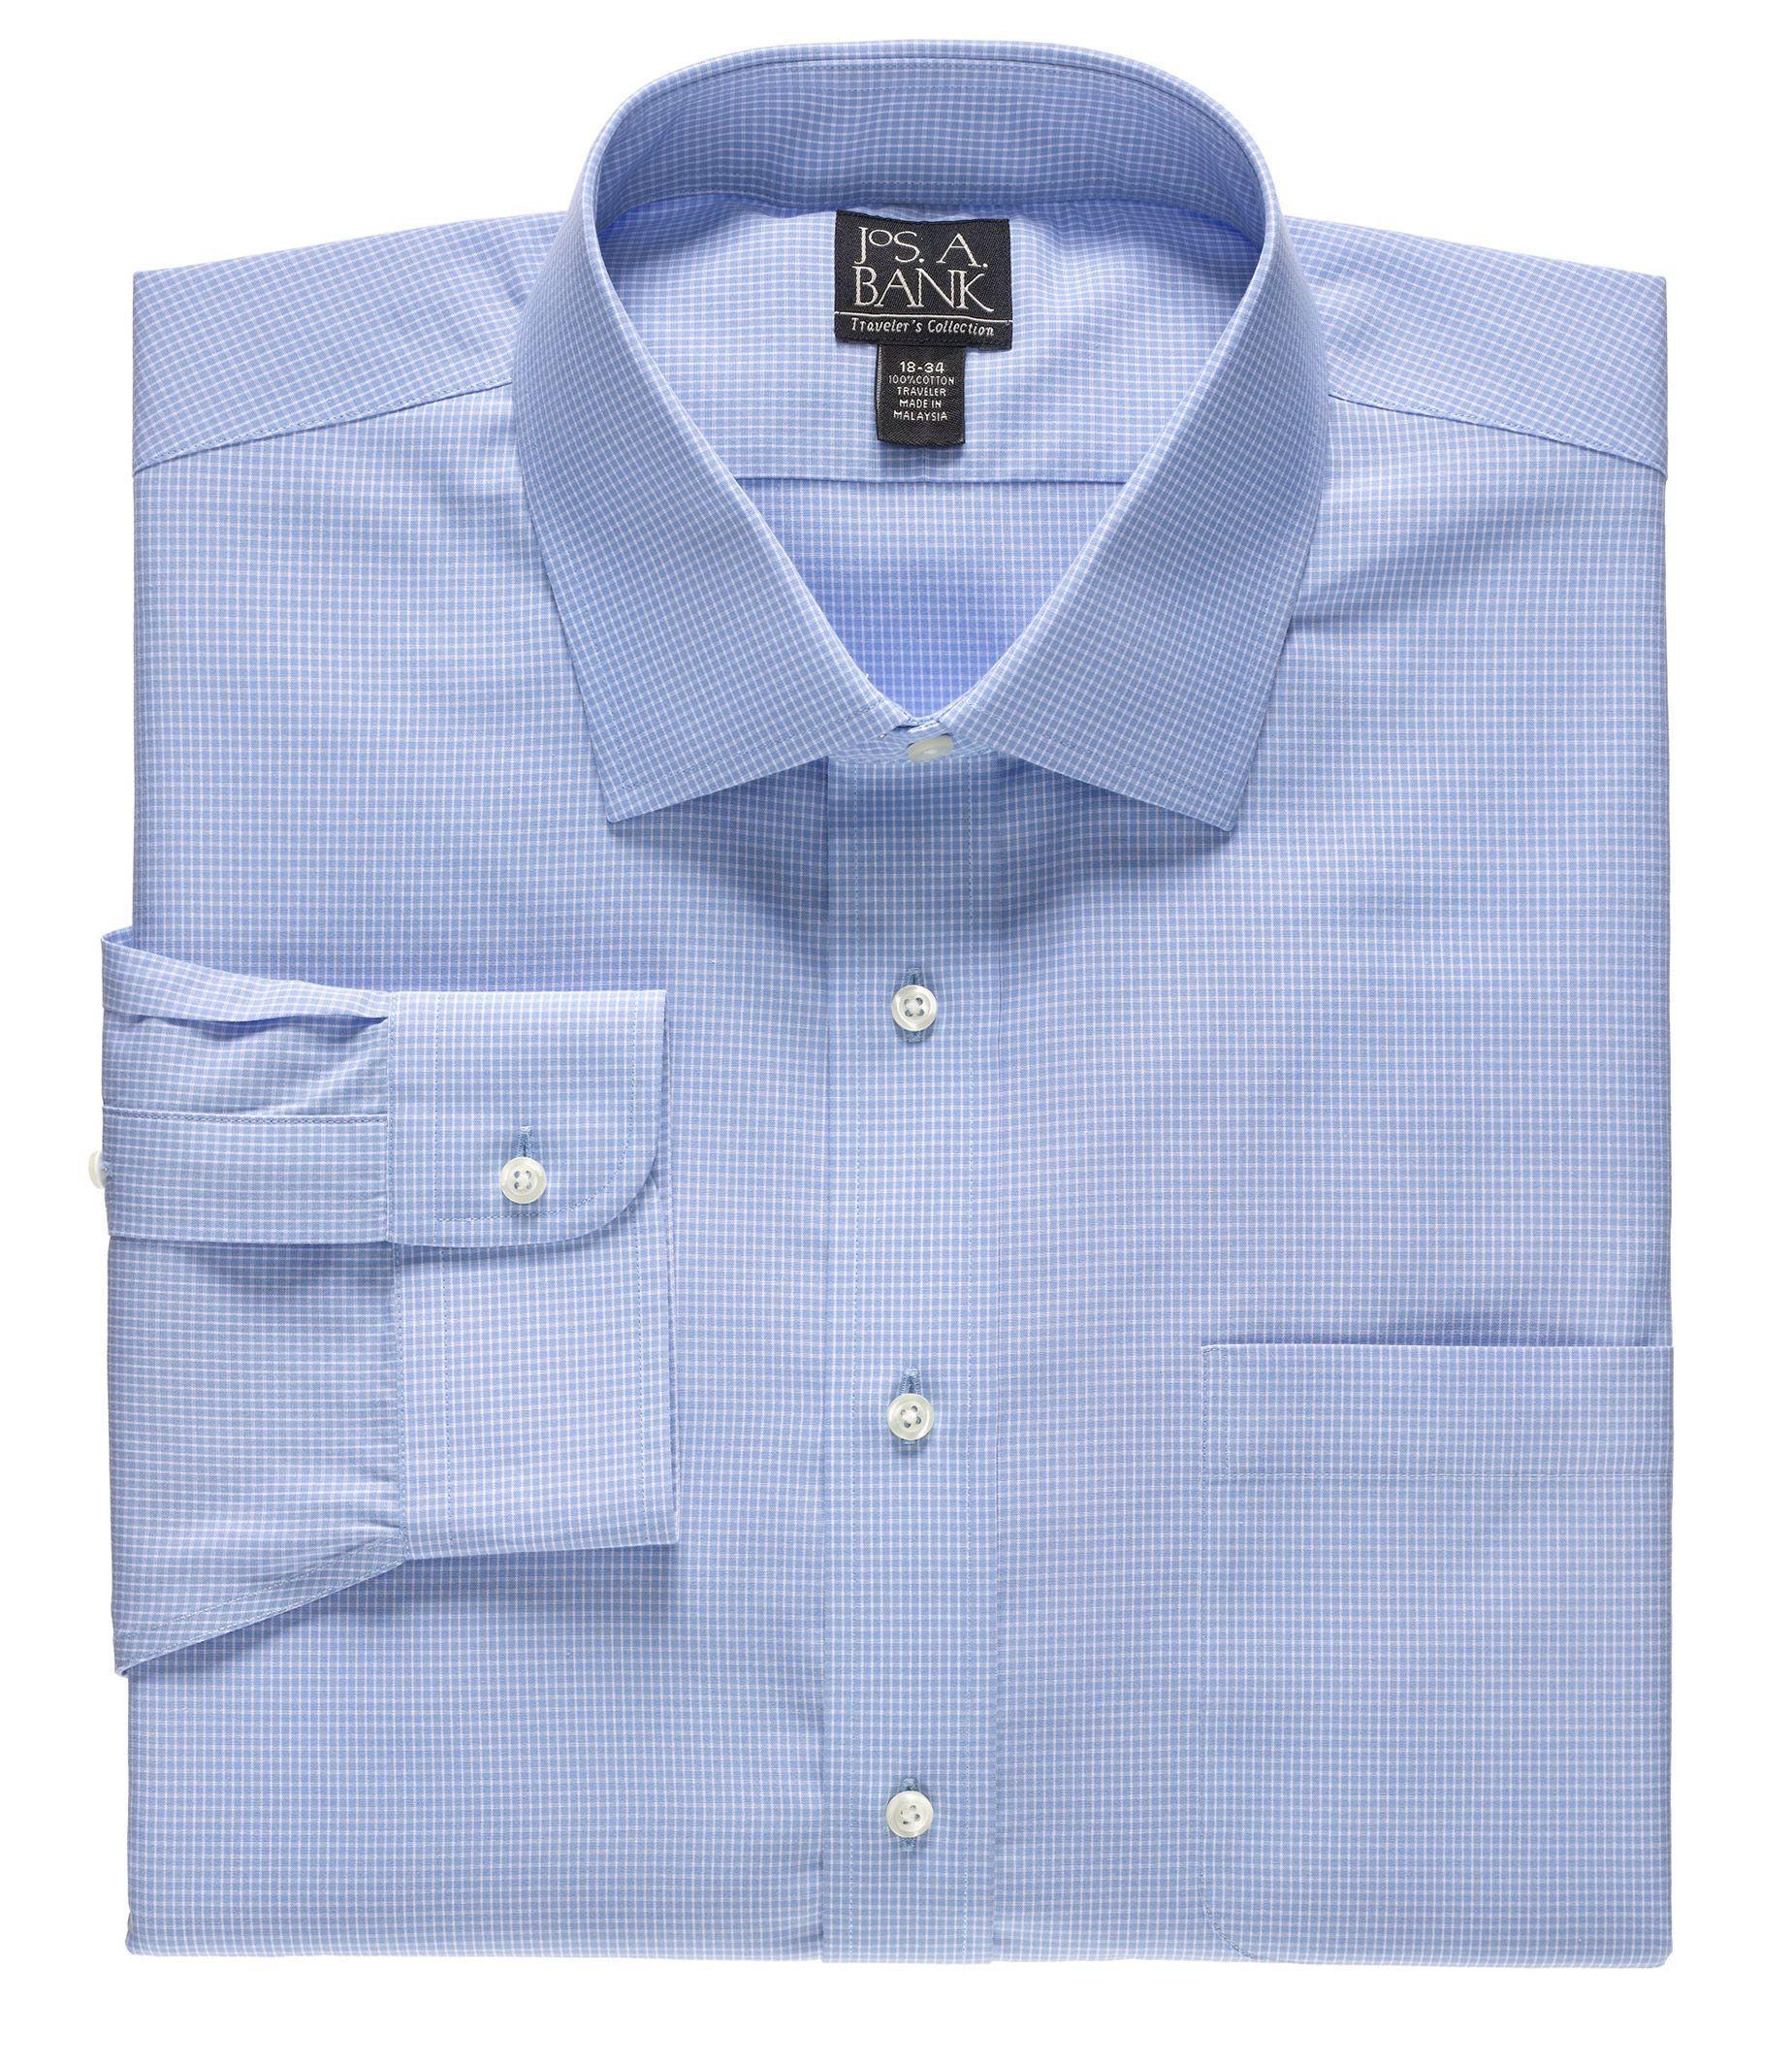 Traveler Wrinkle Free Slim Fit Point Collor Dress Shirt